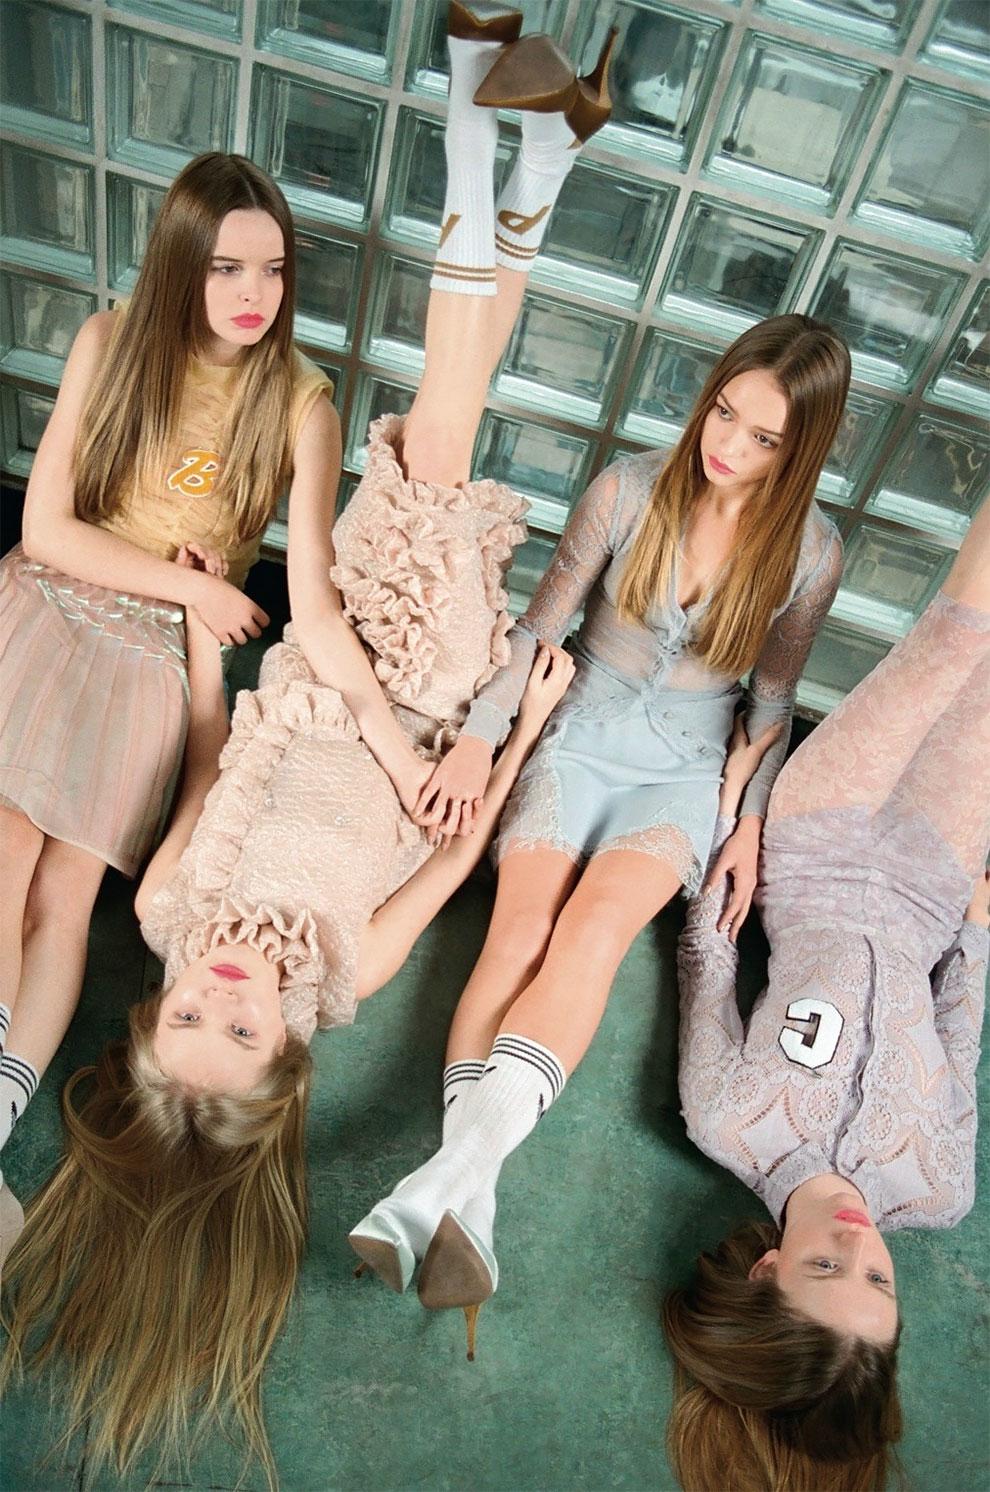 Чешский фотограф Михал Пуделка девочки, девочки, девочки (11).jpg